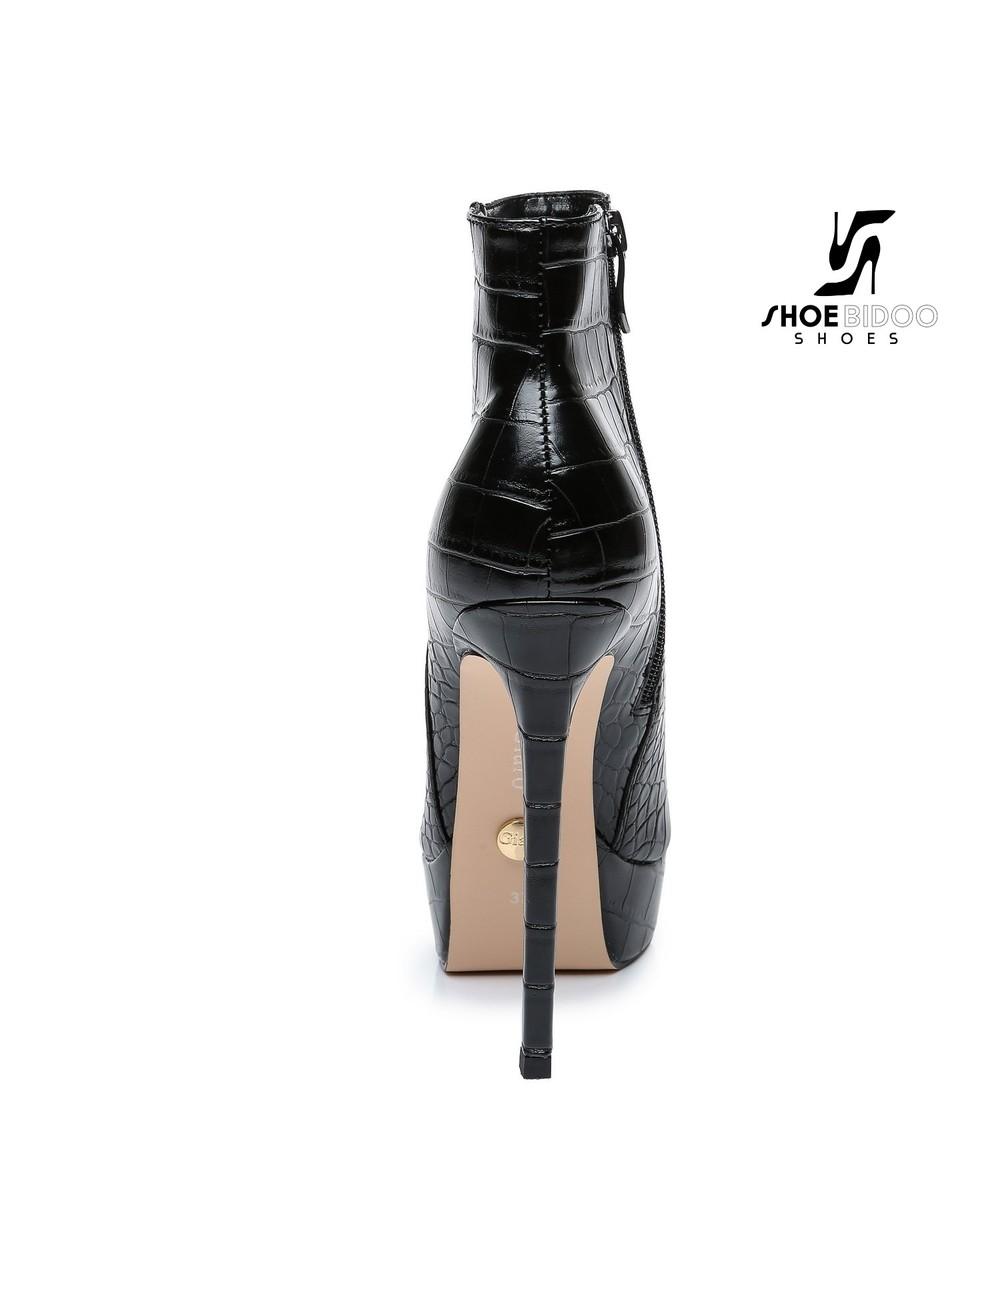 Giaro Giaro Platform ankle boots STACK in black croc print